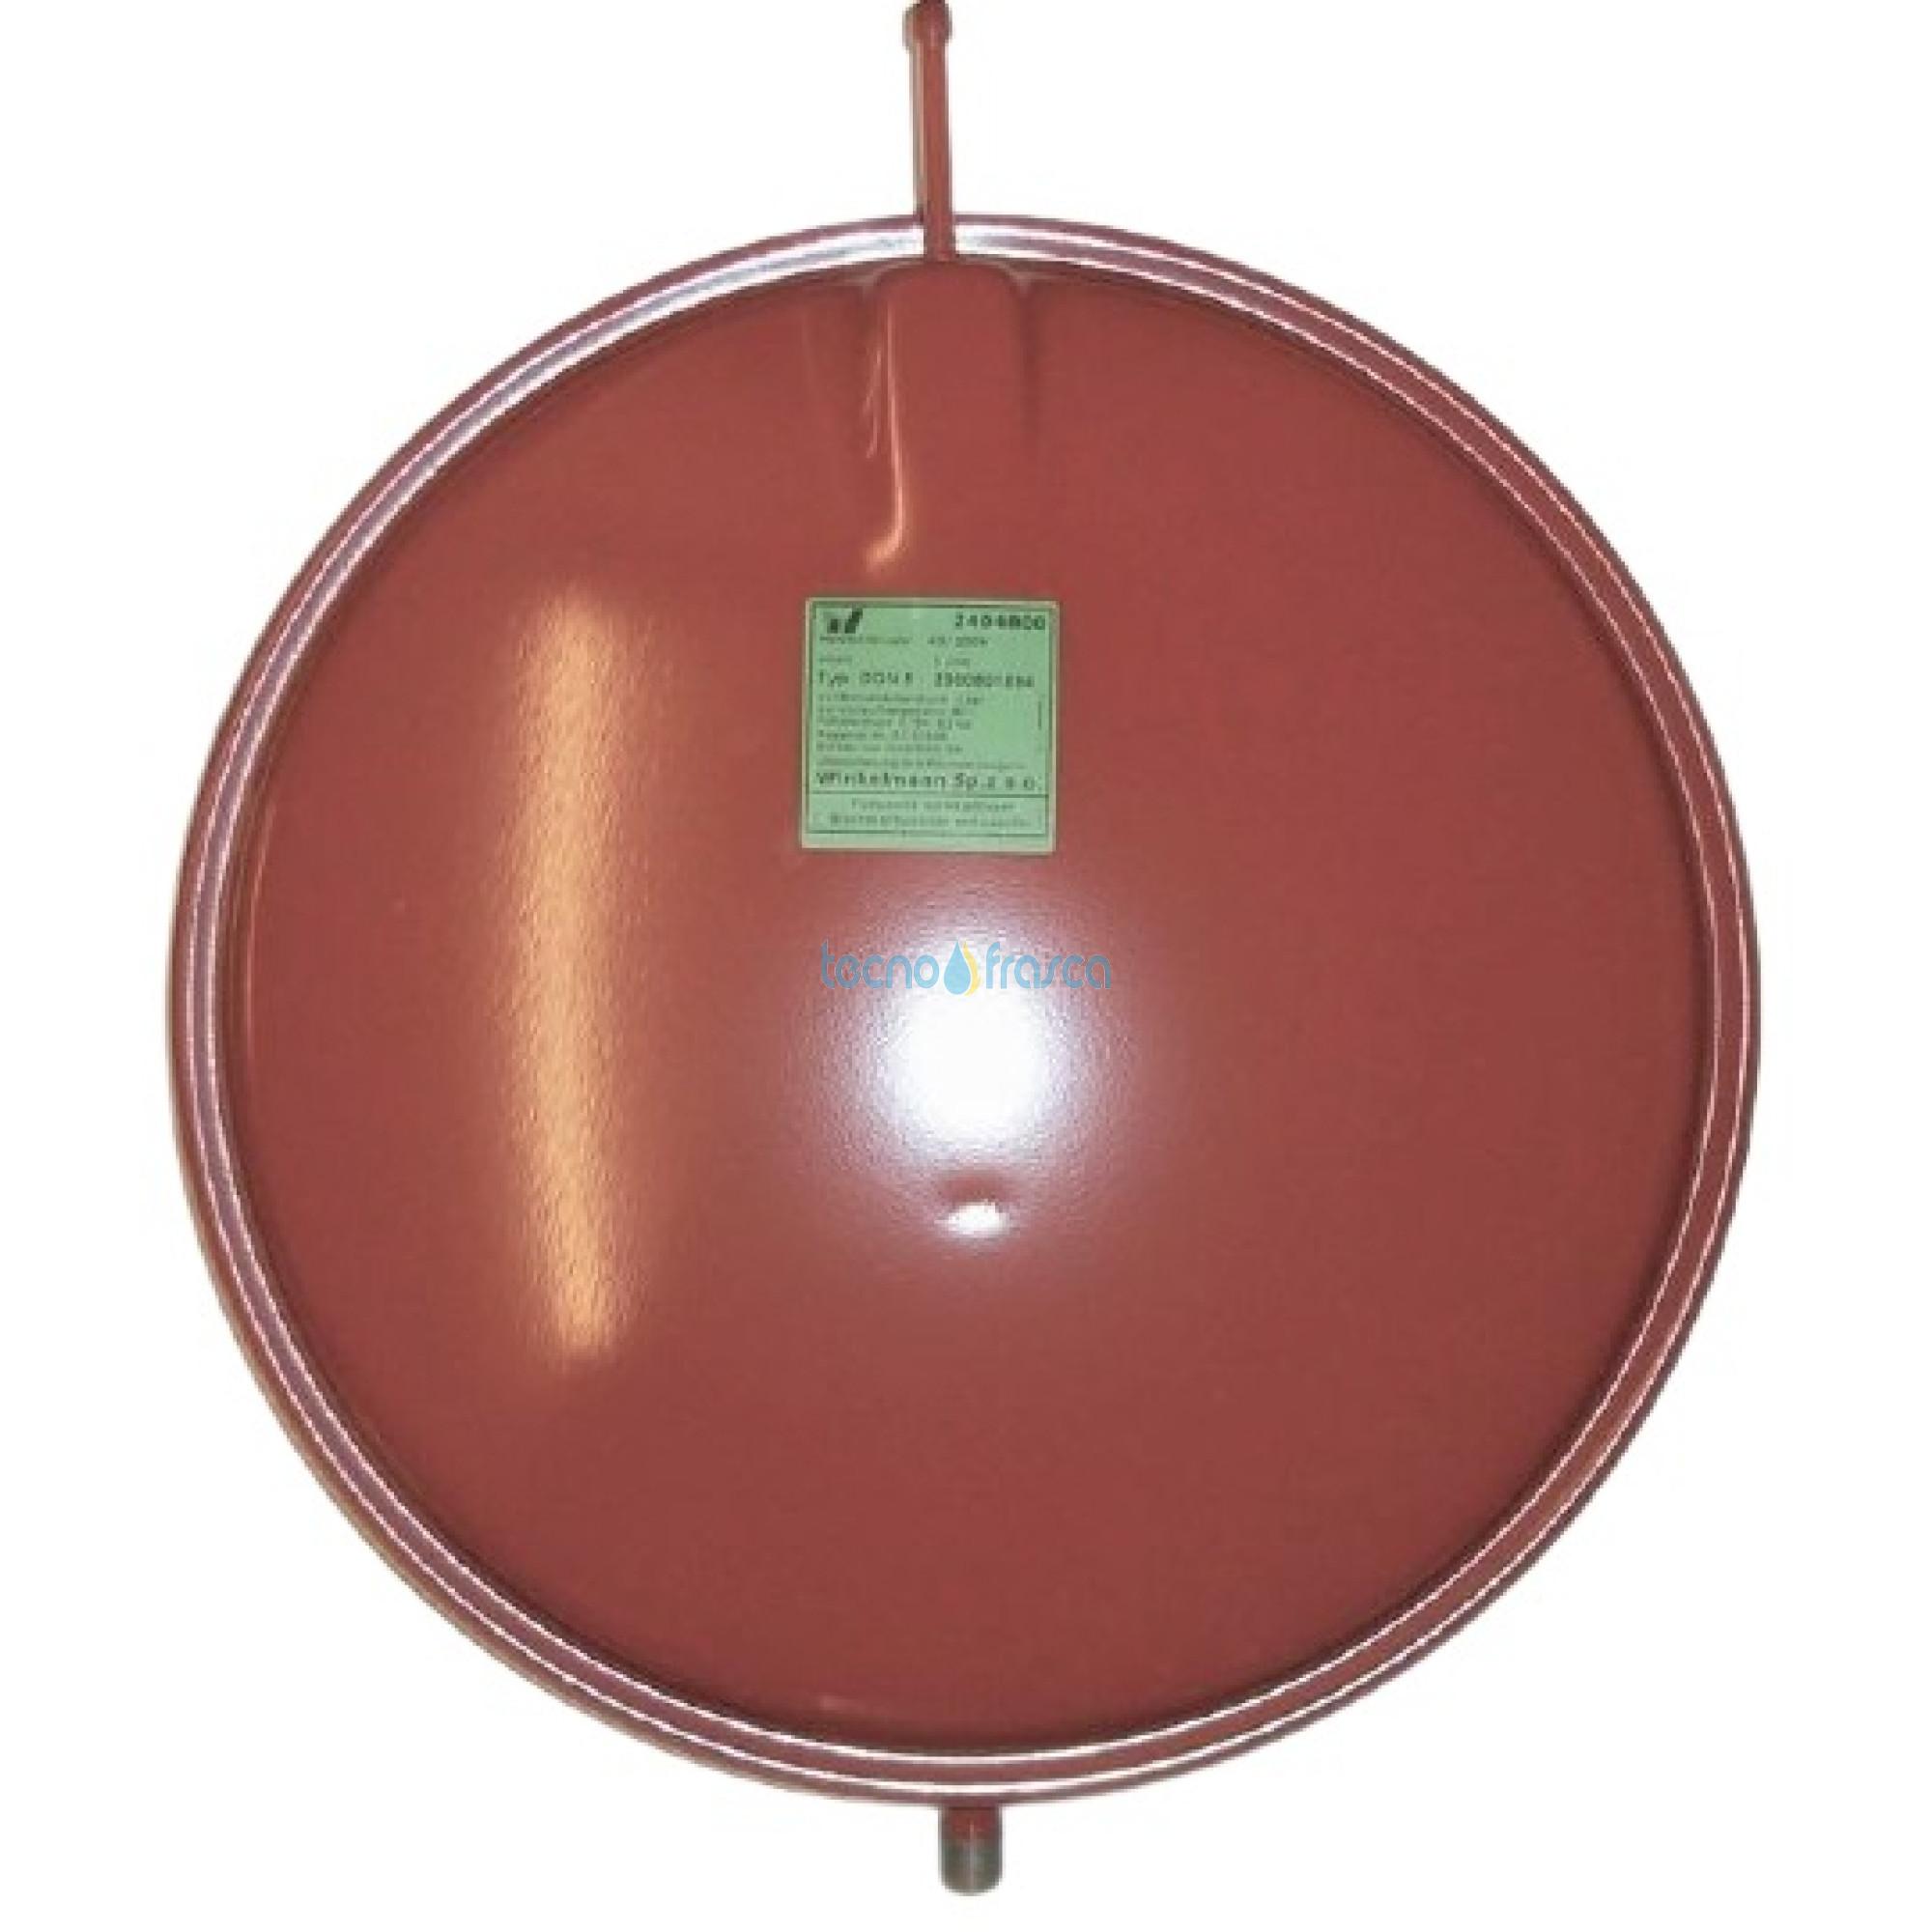 Saunier duval vaso di espansione lt 5 s1005000